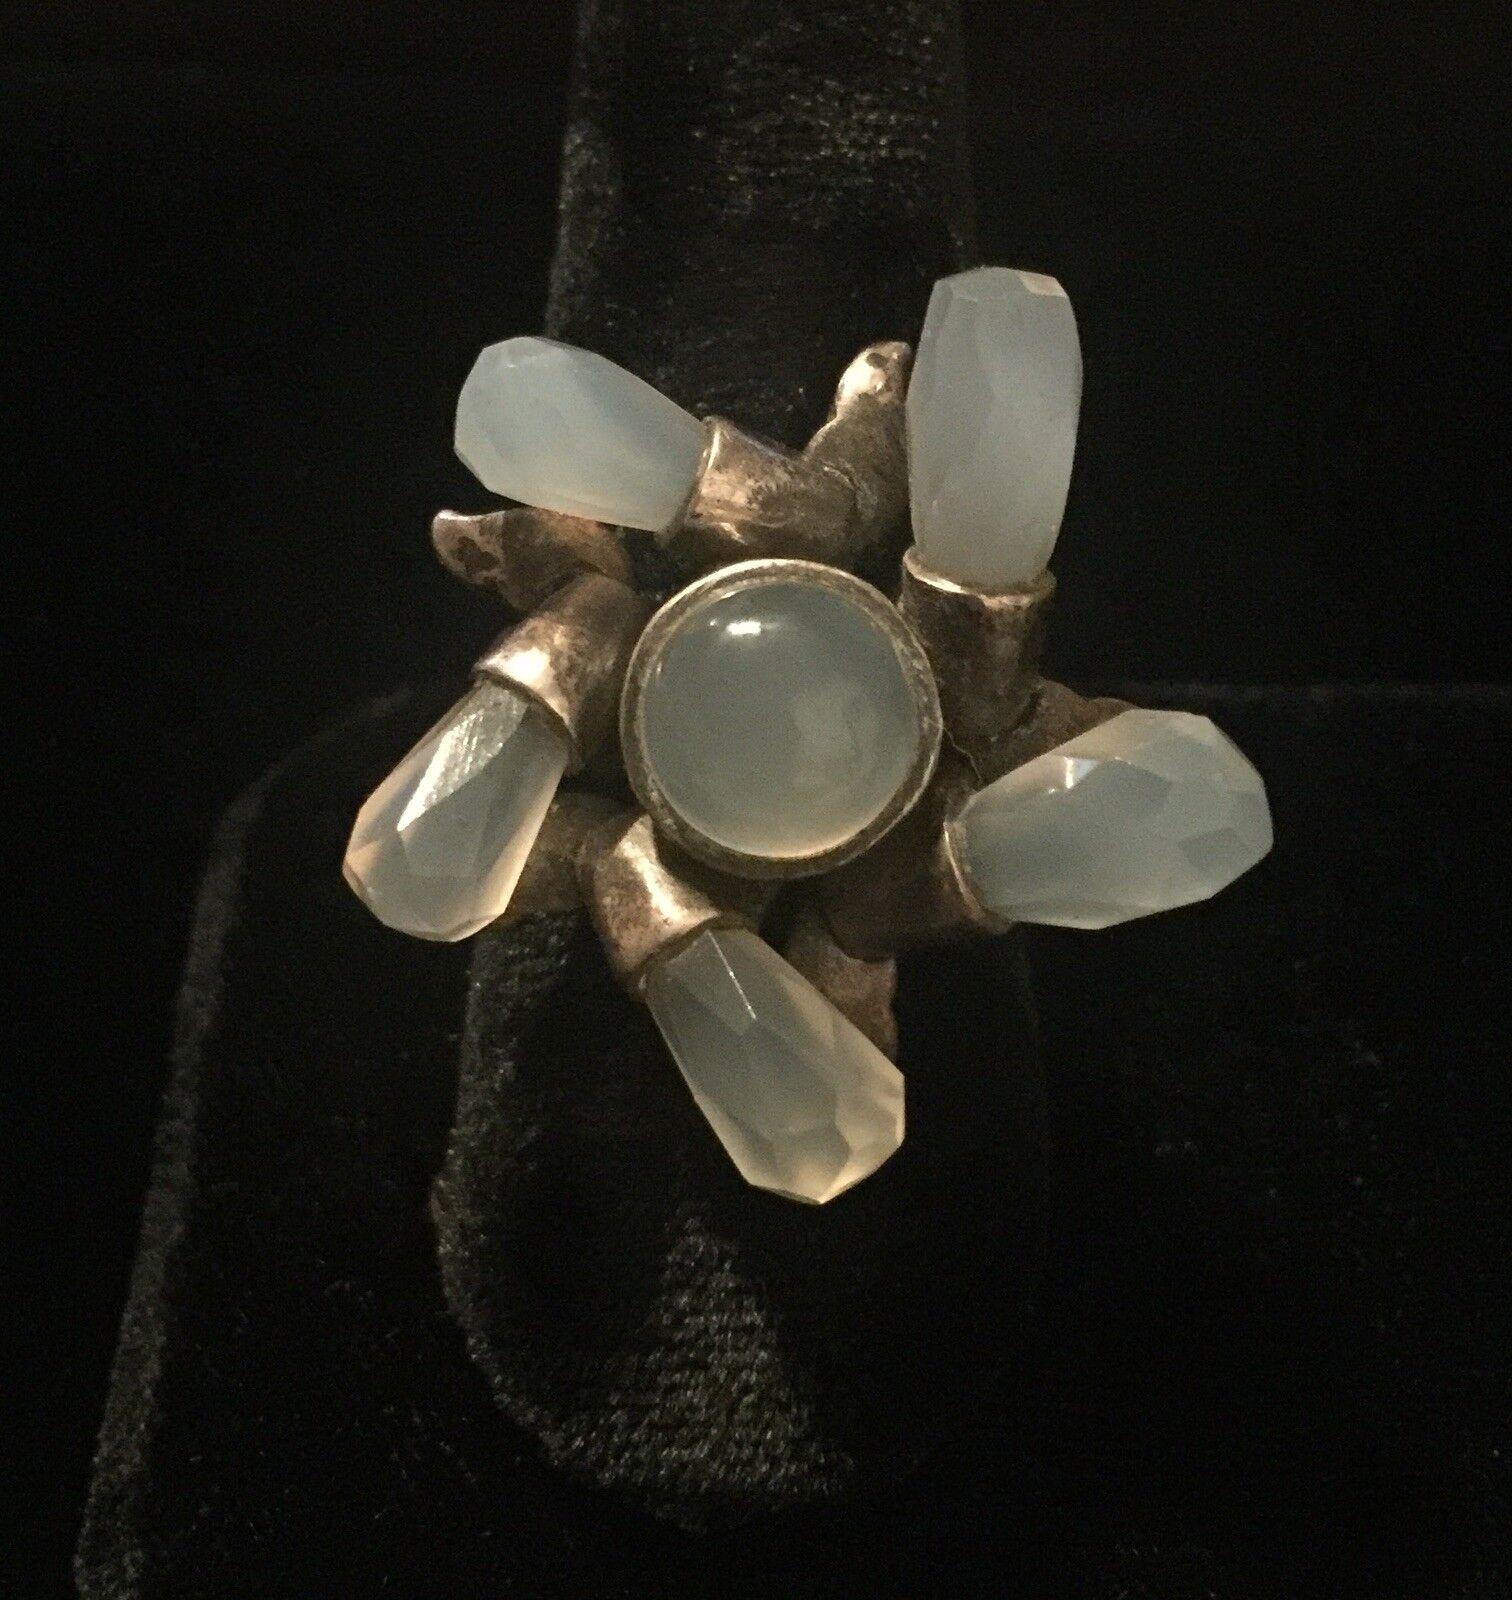 Very Special Vintage Artisan Moonstone Flower Ring